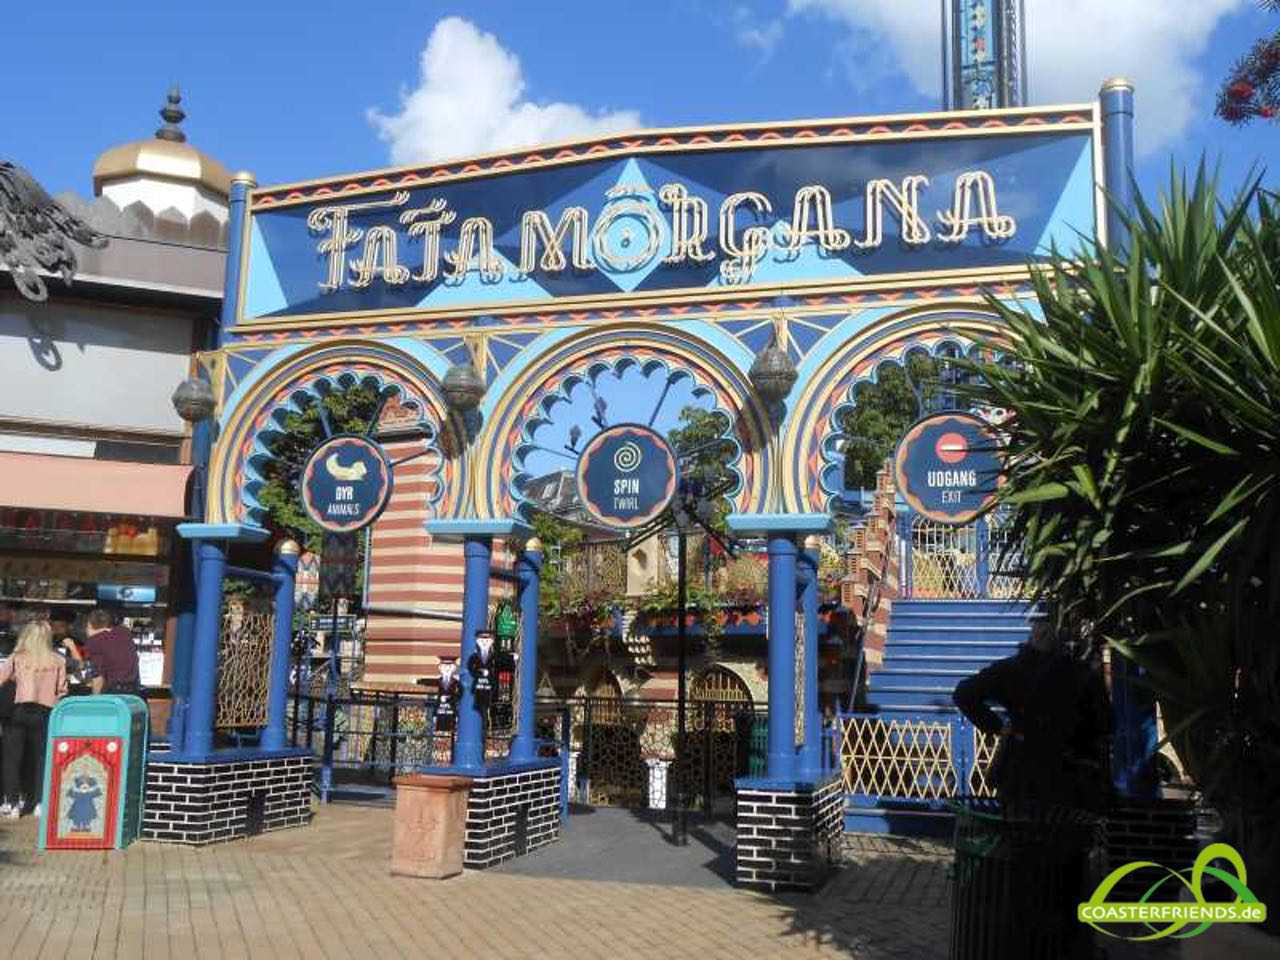 Tivoli Gardens Impressionen